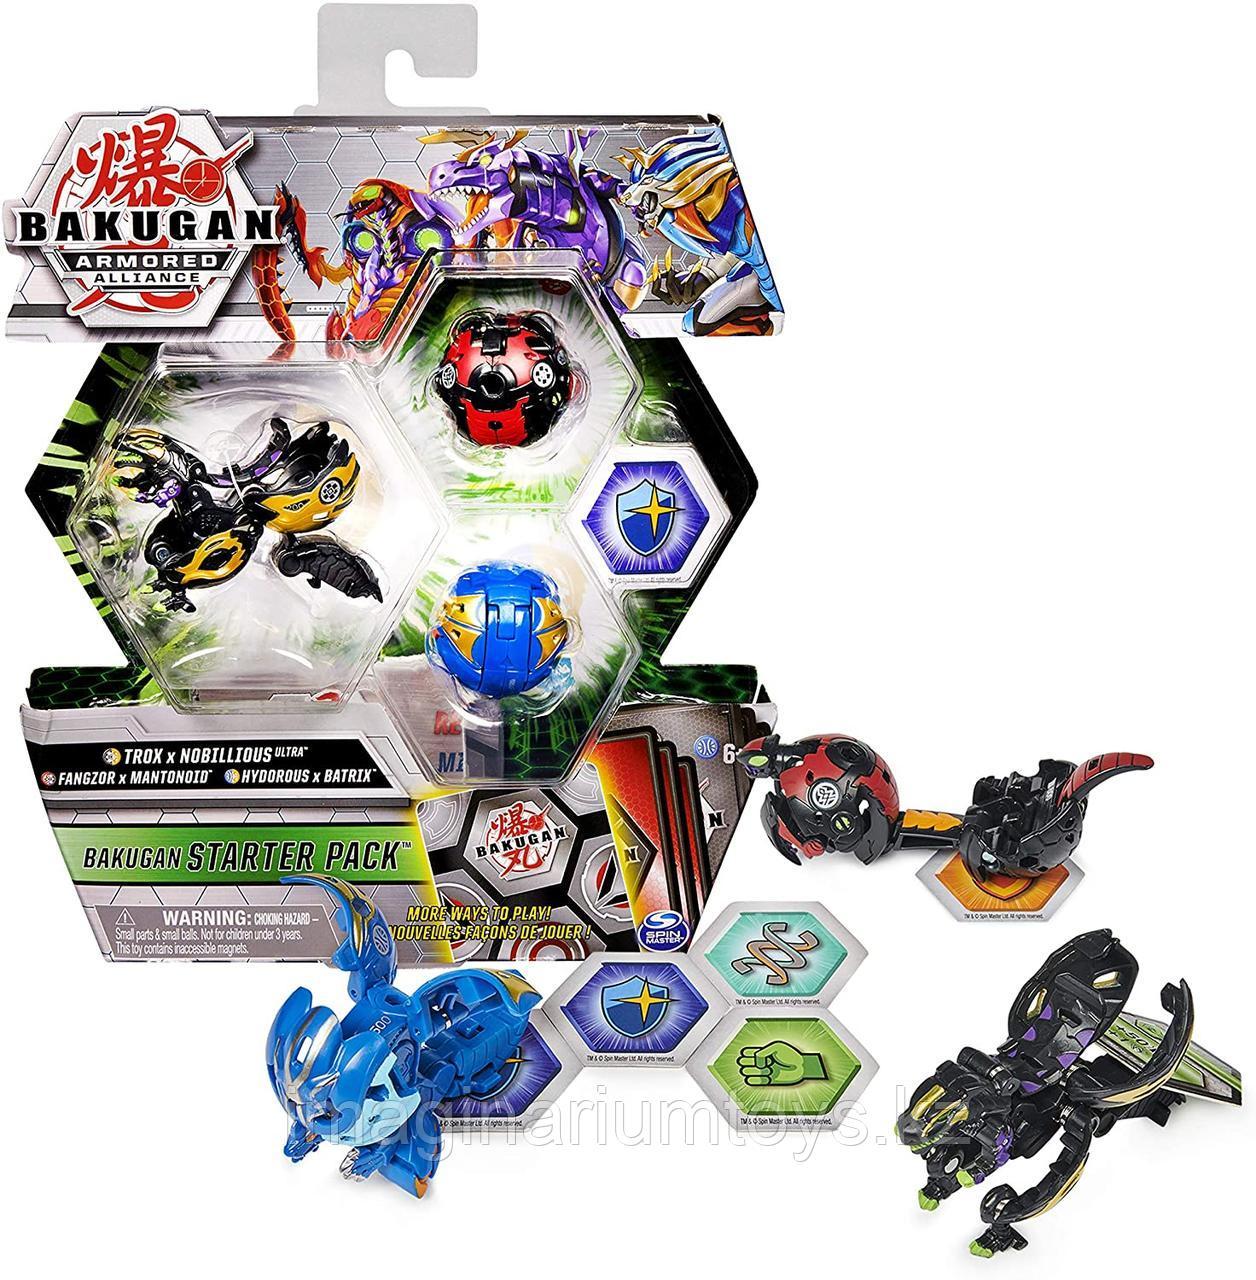 Бакуганы стартовый набор Bakugan Fused Trox и Nobilious Ultra, Armored Alliance